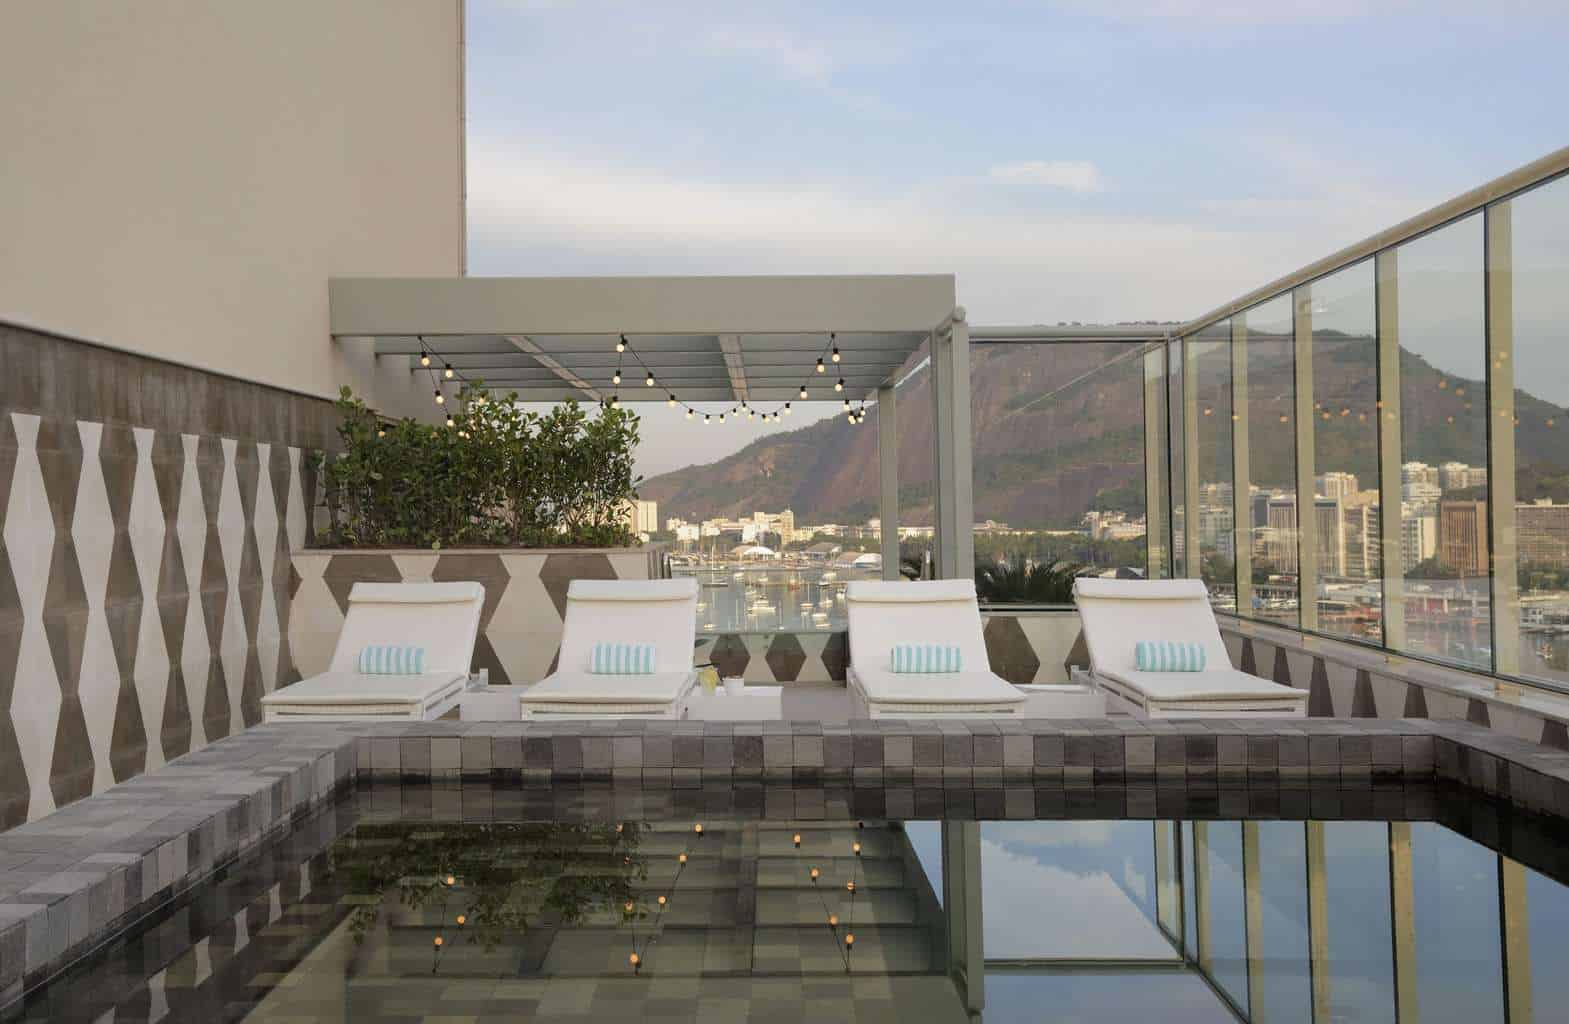 dia-dos-namorados-hotel-yoo2-rooftop3